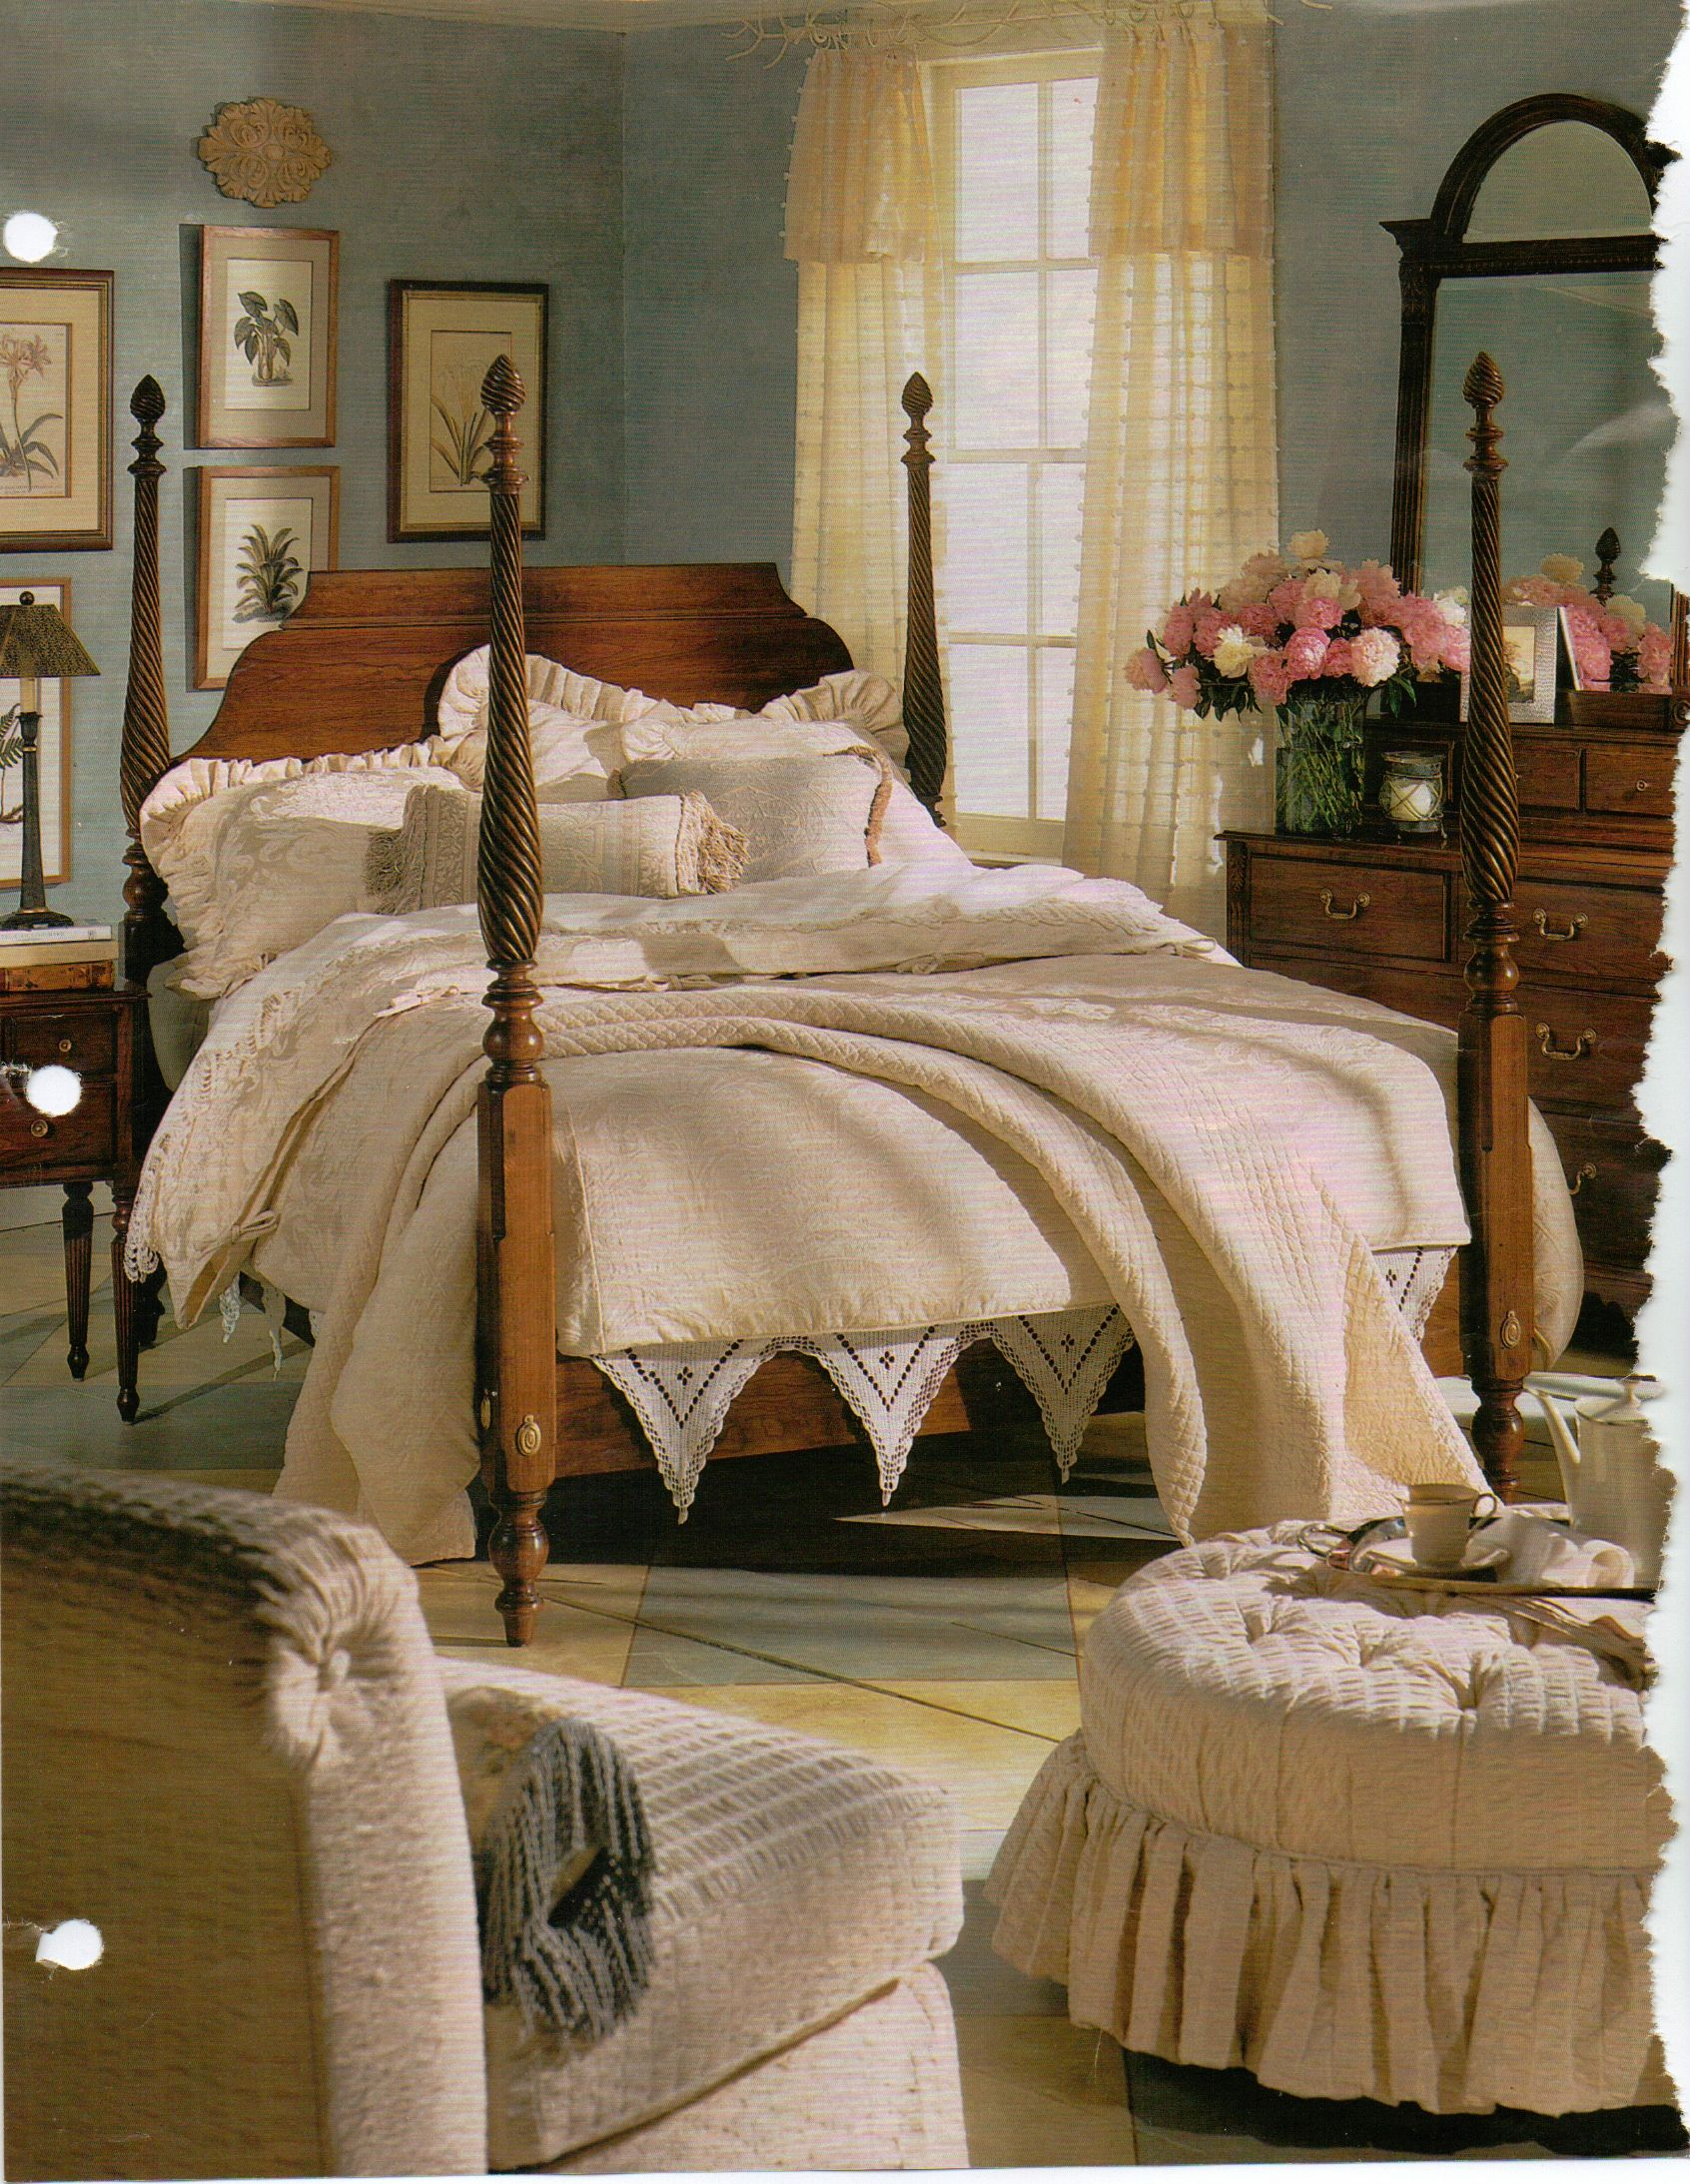 a perfect bedroom in my bedroom colors | Bedroom colors ...